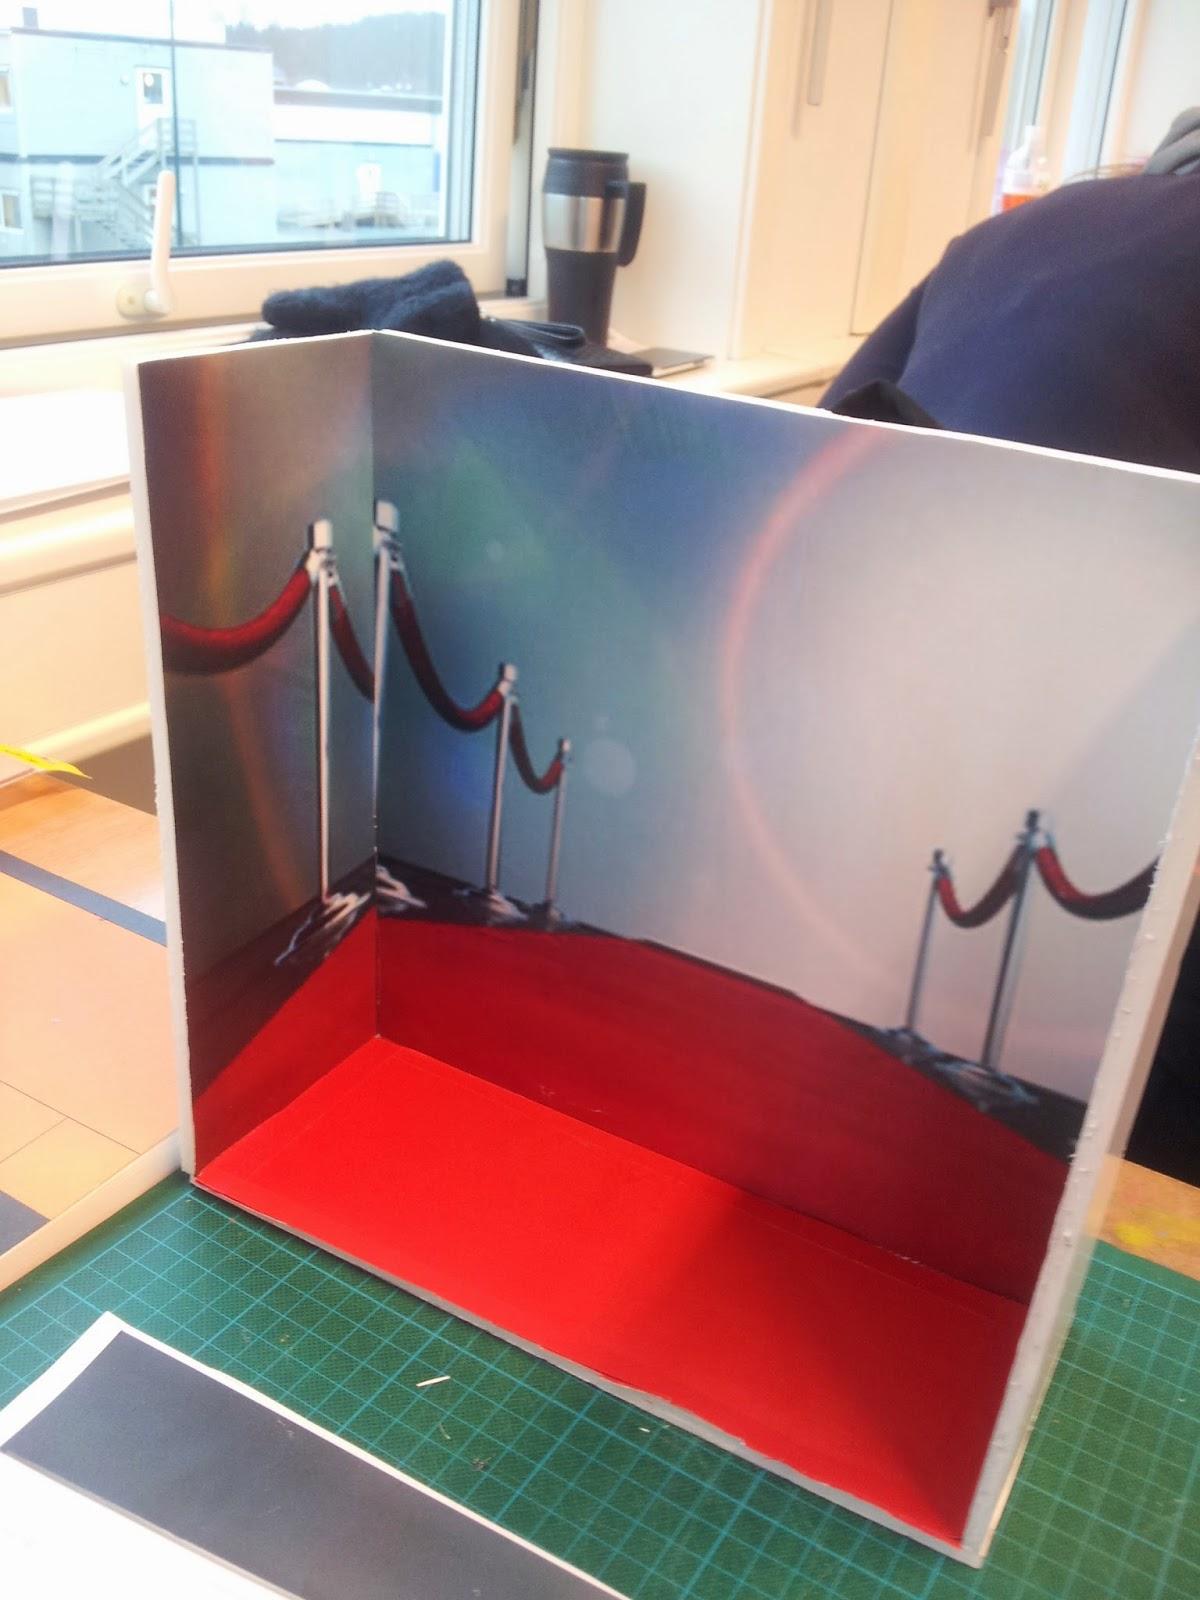 Martines fagblogg: Utstillingsdesign kurs dag 4